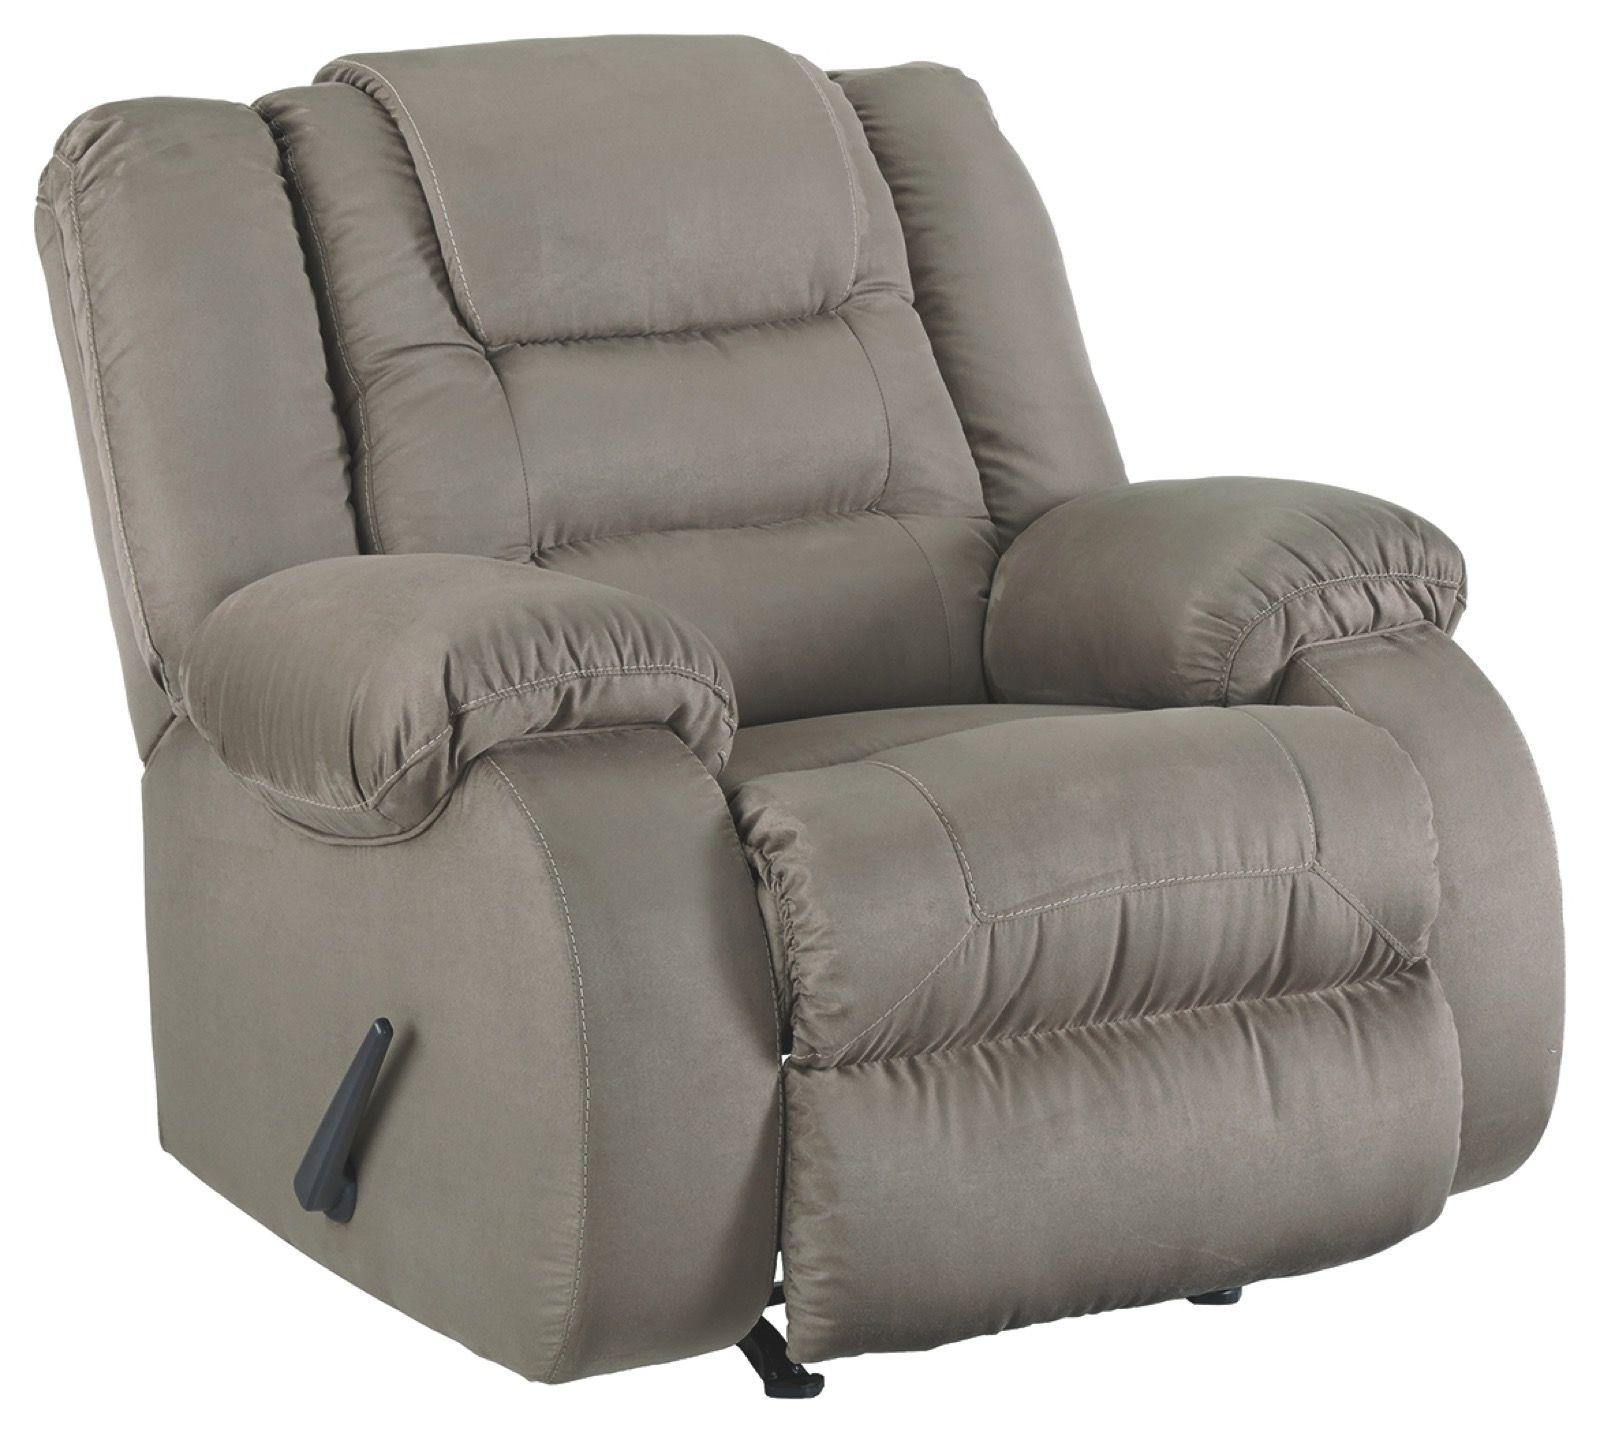 Prime Signature Design Mccade Cobblestone Rocker Recliner Unemploymentrelief Wooden Chair Designs For Living Room Unemploymentrelieforg